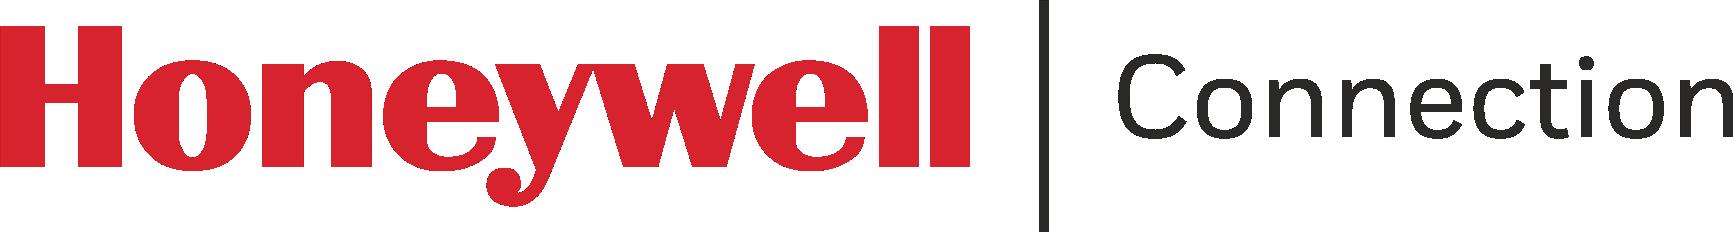 Honeywell Connection